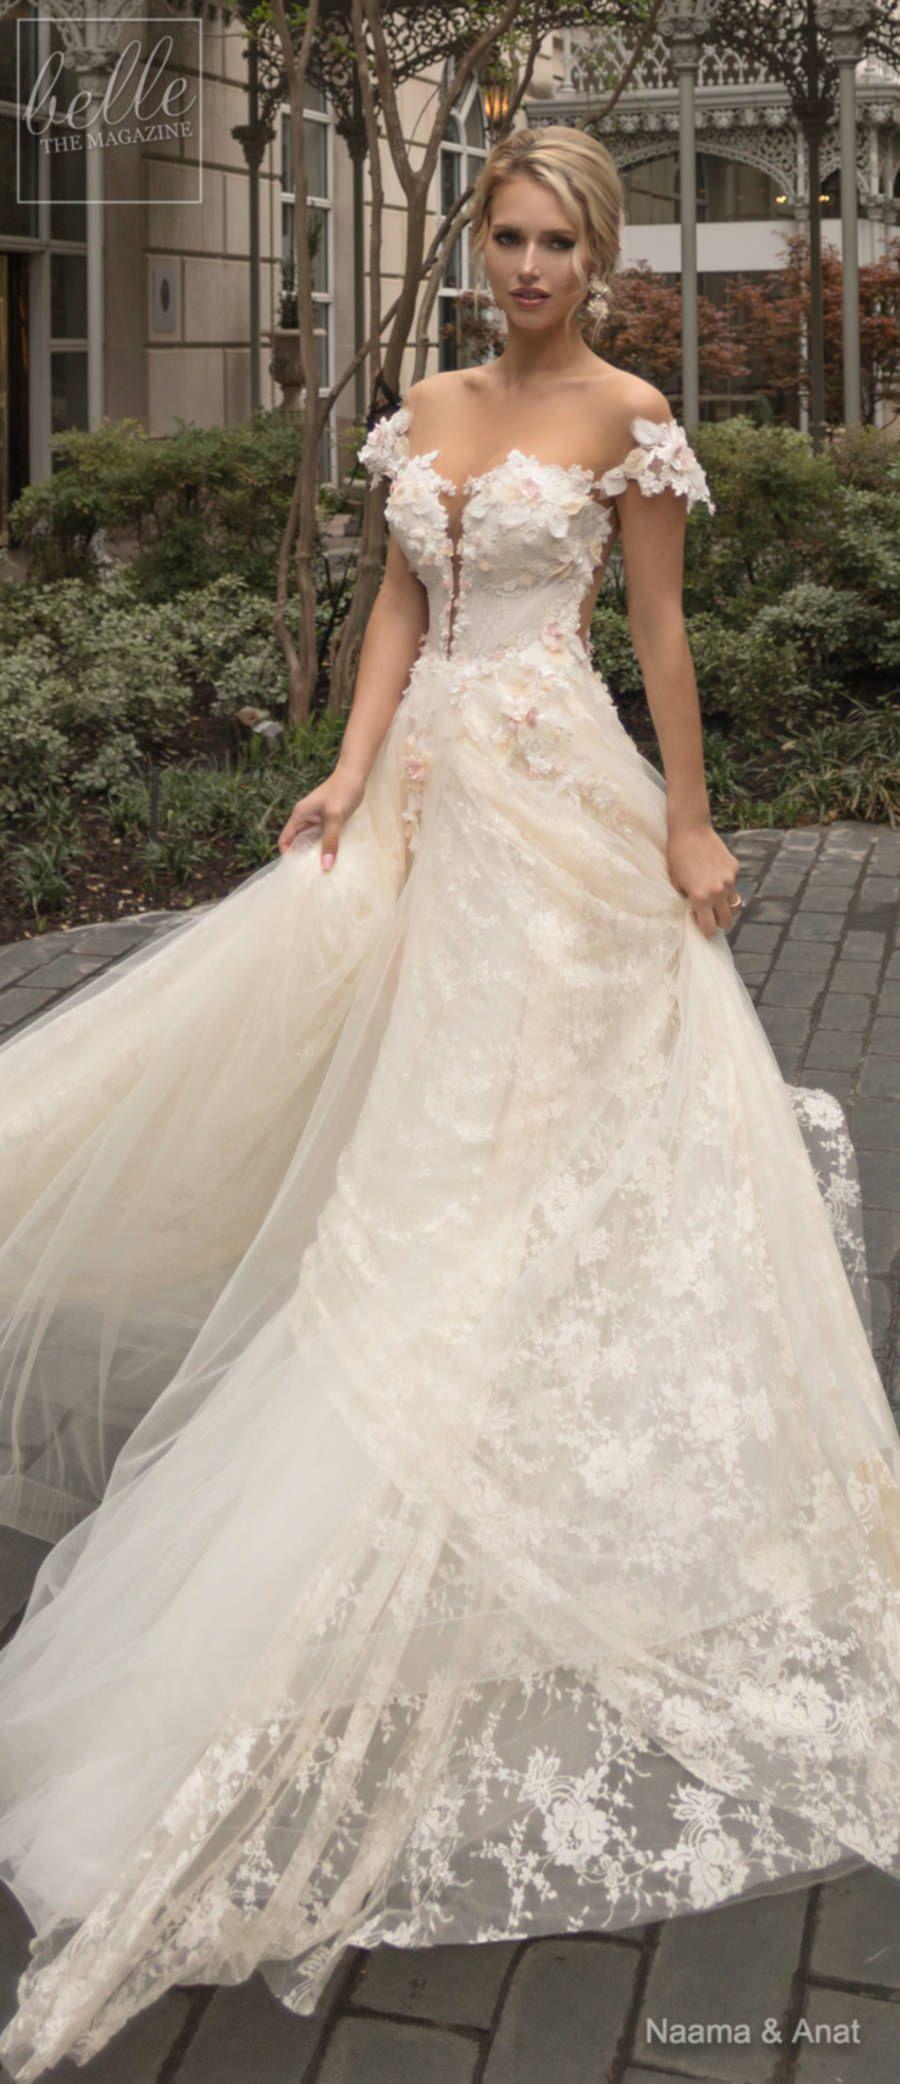 Naama and Anat Wedding Dress Collection 2019 Dancing Up the Aisle  Weddings